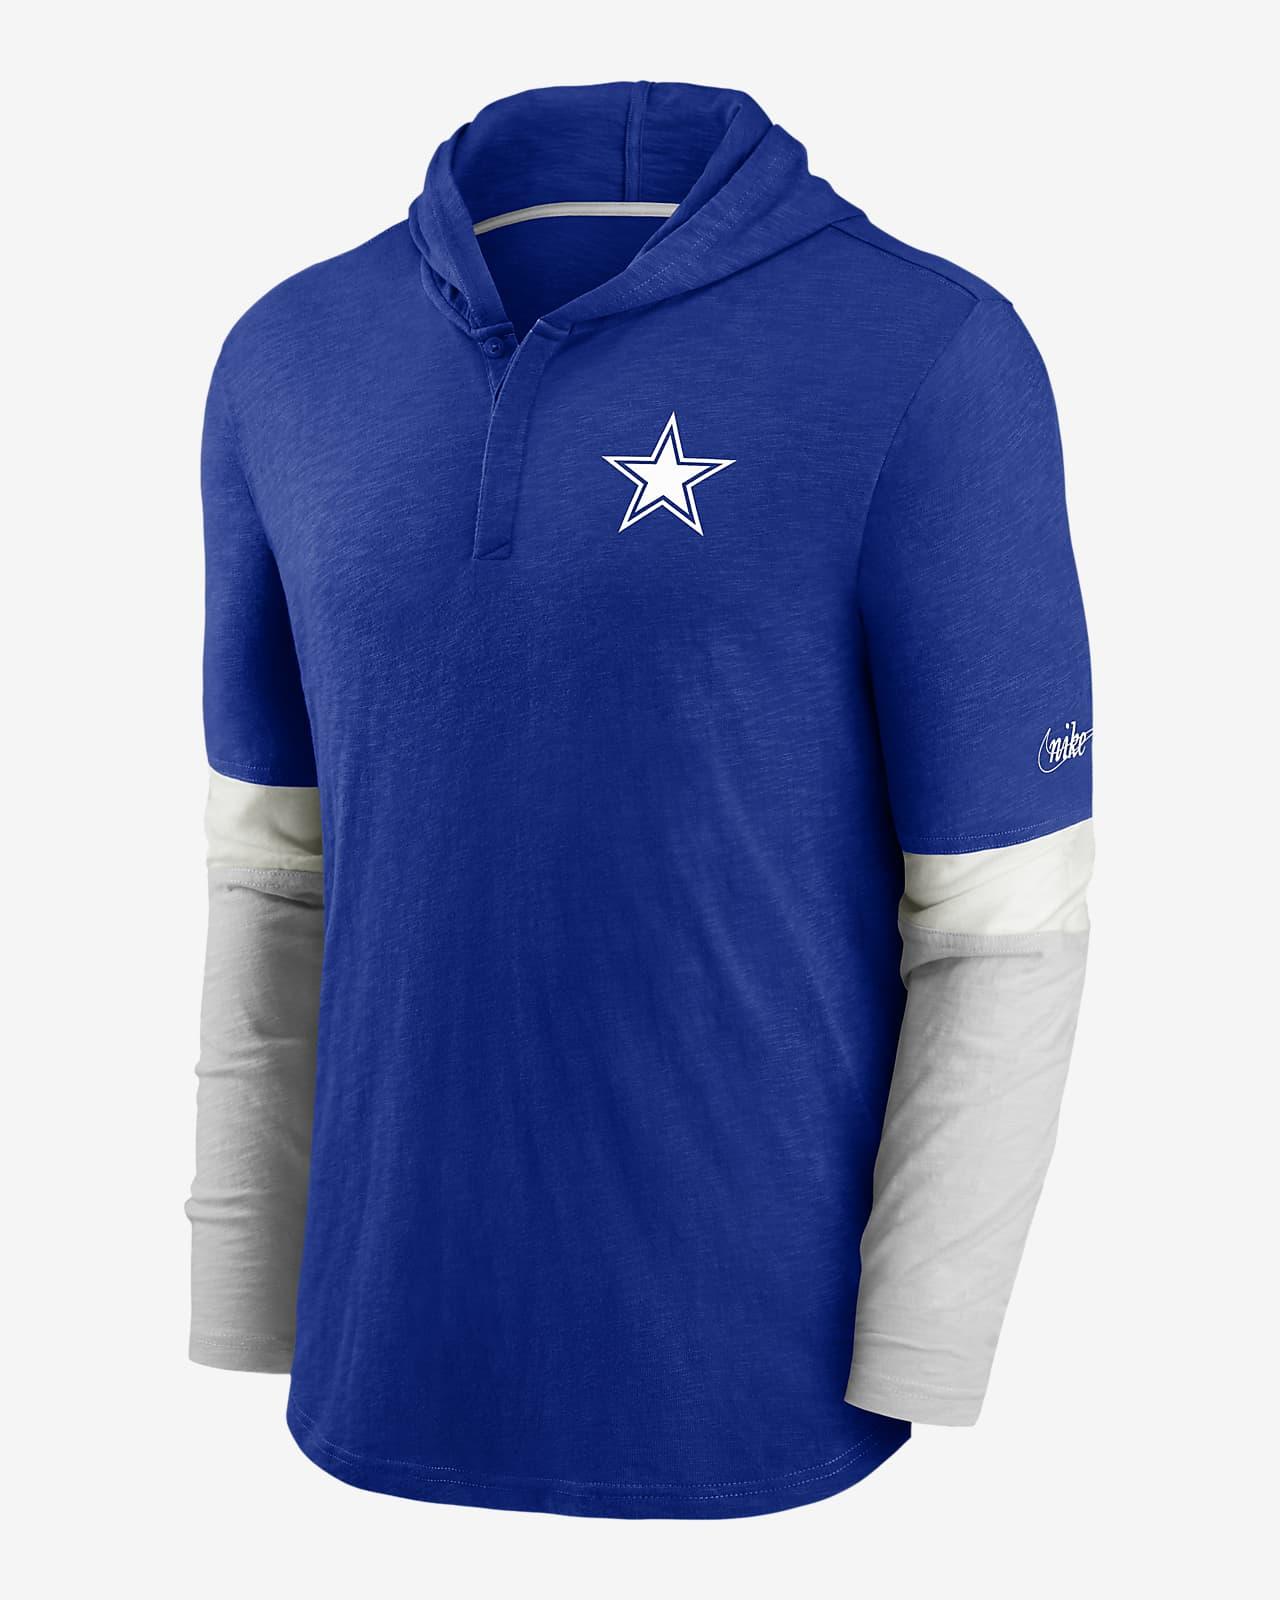 Nike Historic (NFL Cowboys) Men's Long-Sleeve Hooded Henley